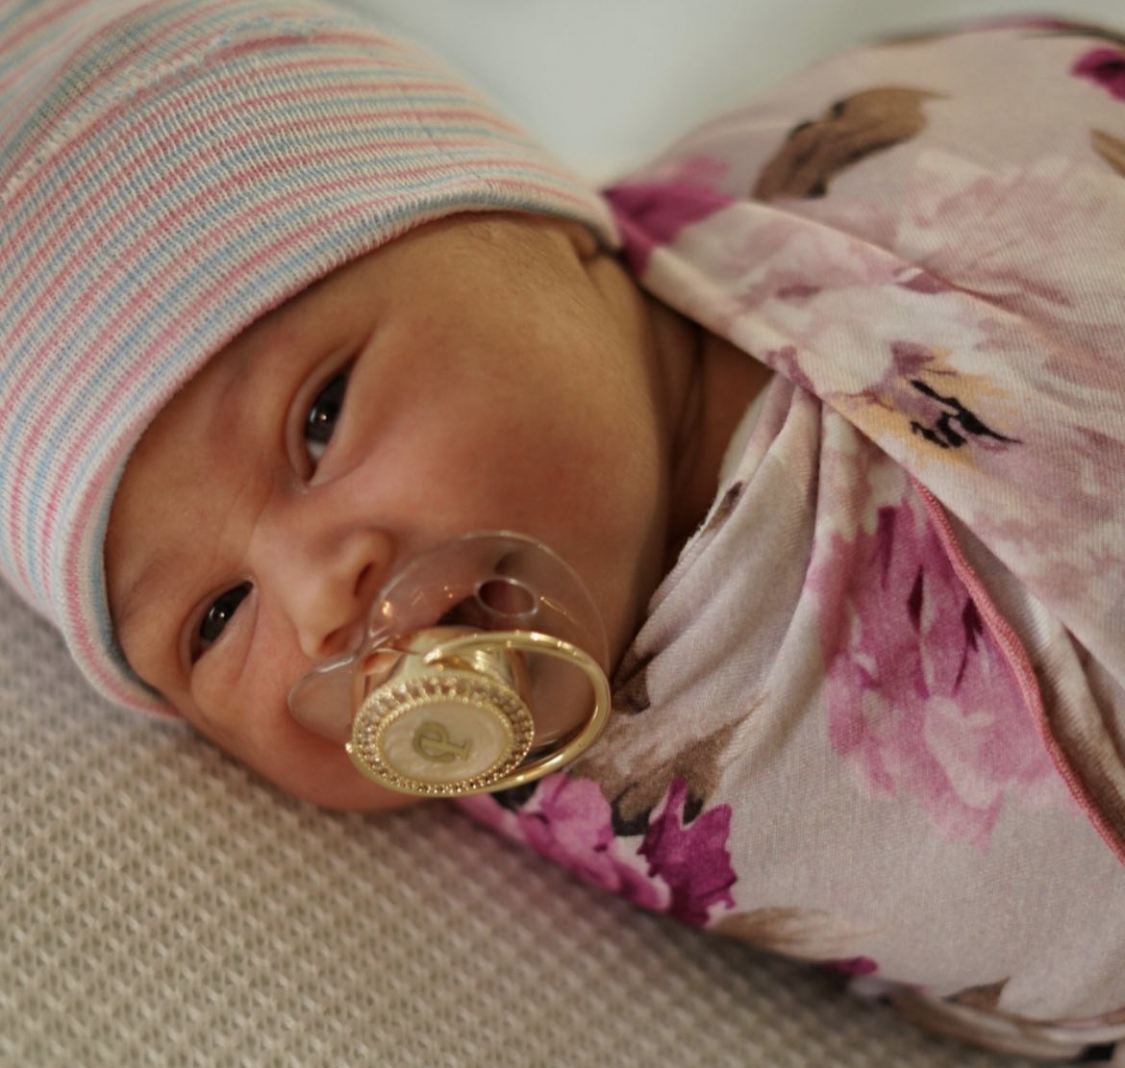 Vida Isabelle Pina bebé Natti Natasha